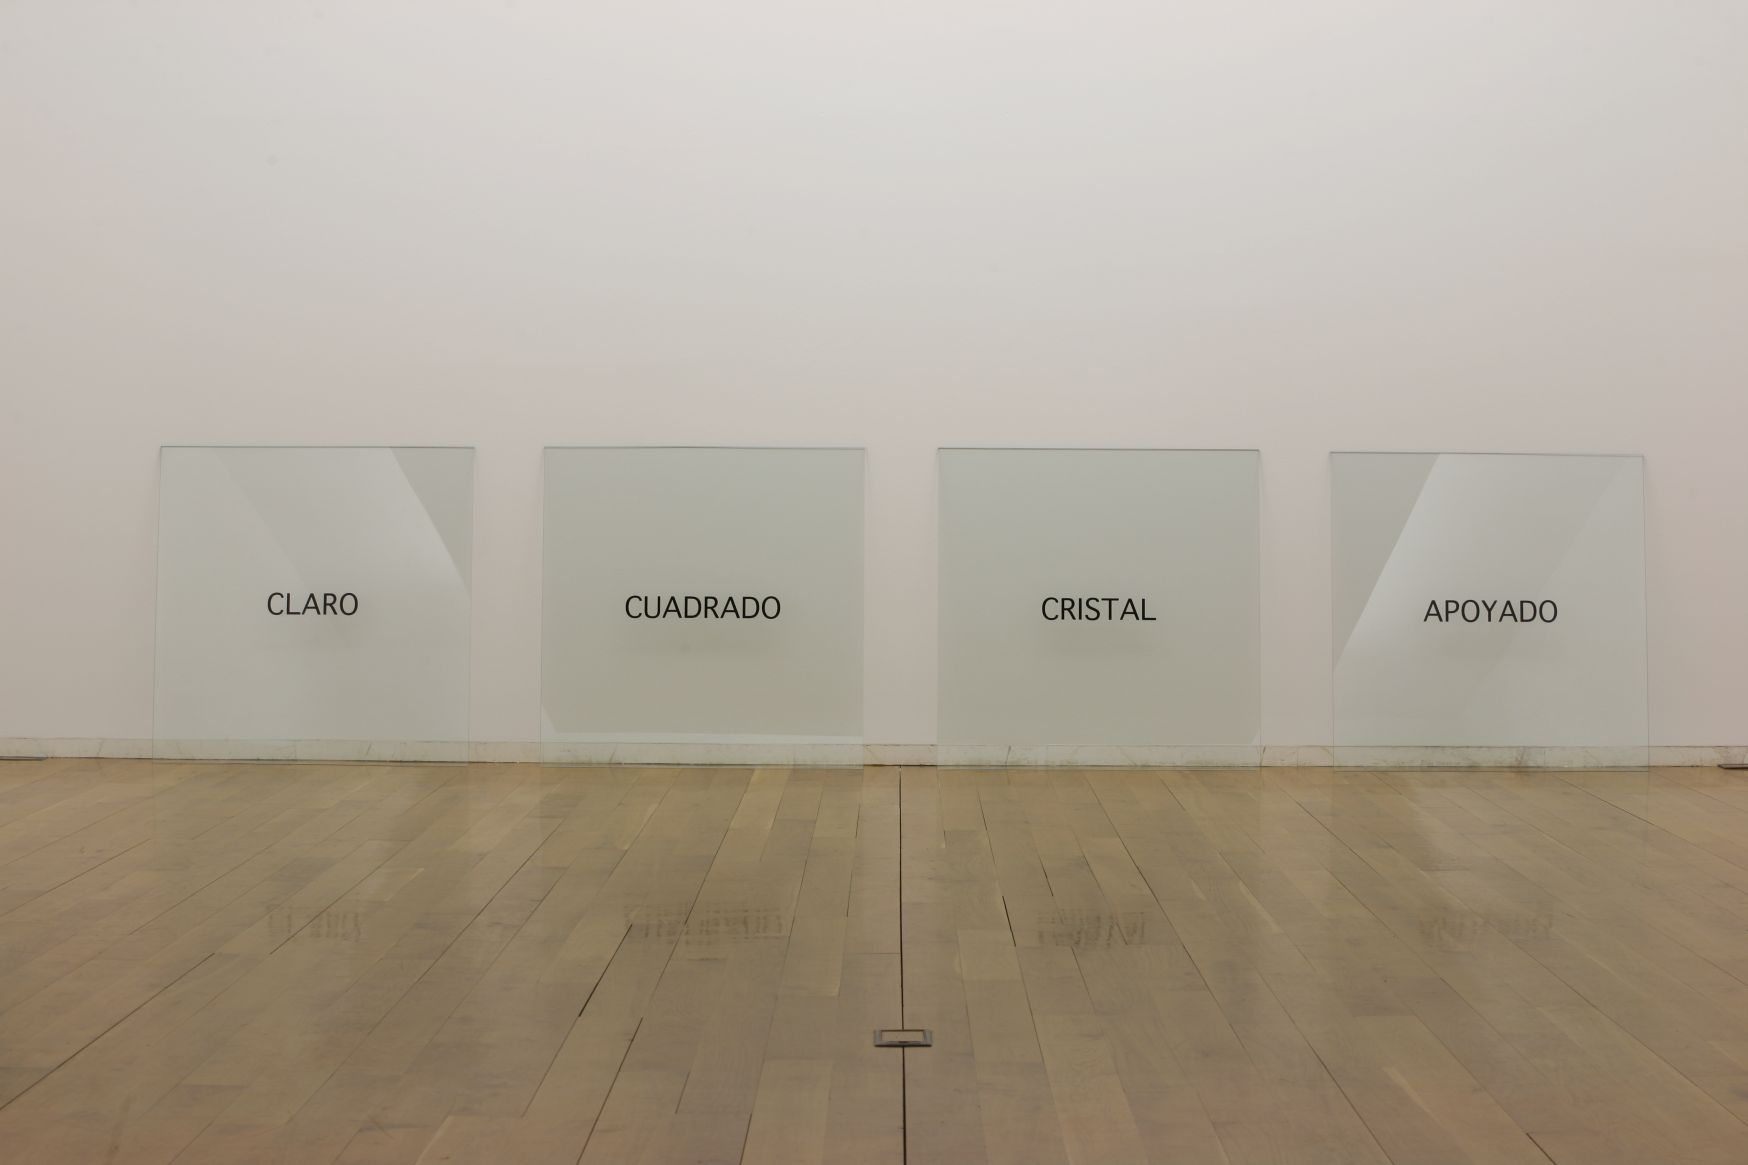 Claro, cuadrado, cristal, apoyado (1965) - Joseph Kosuth